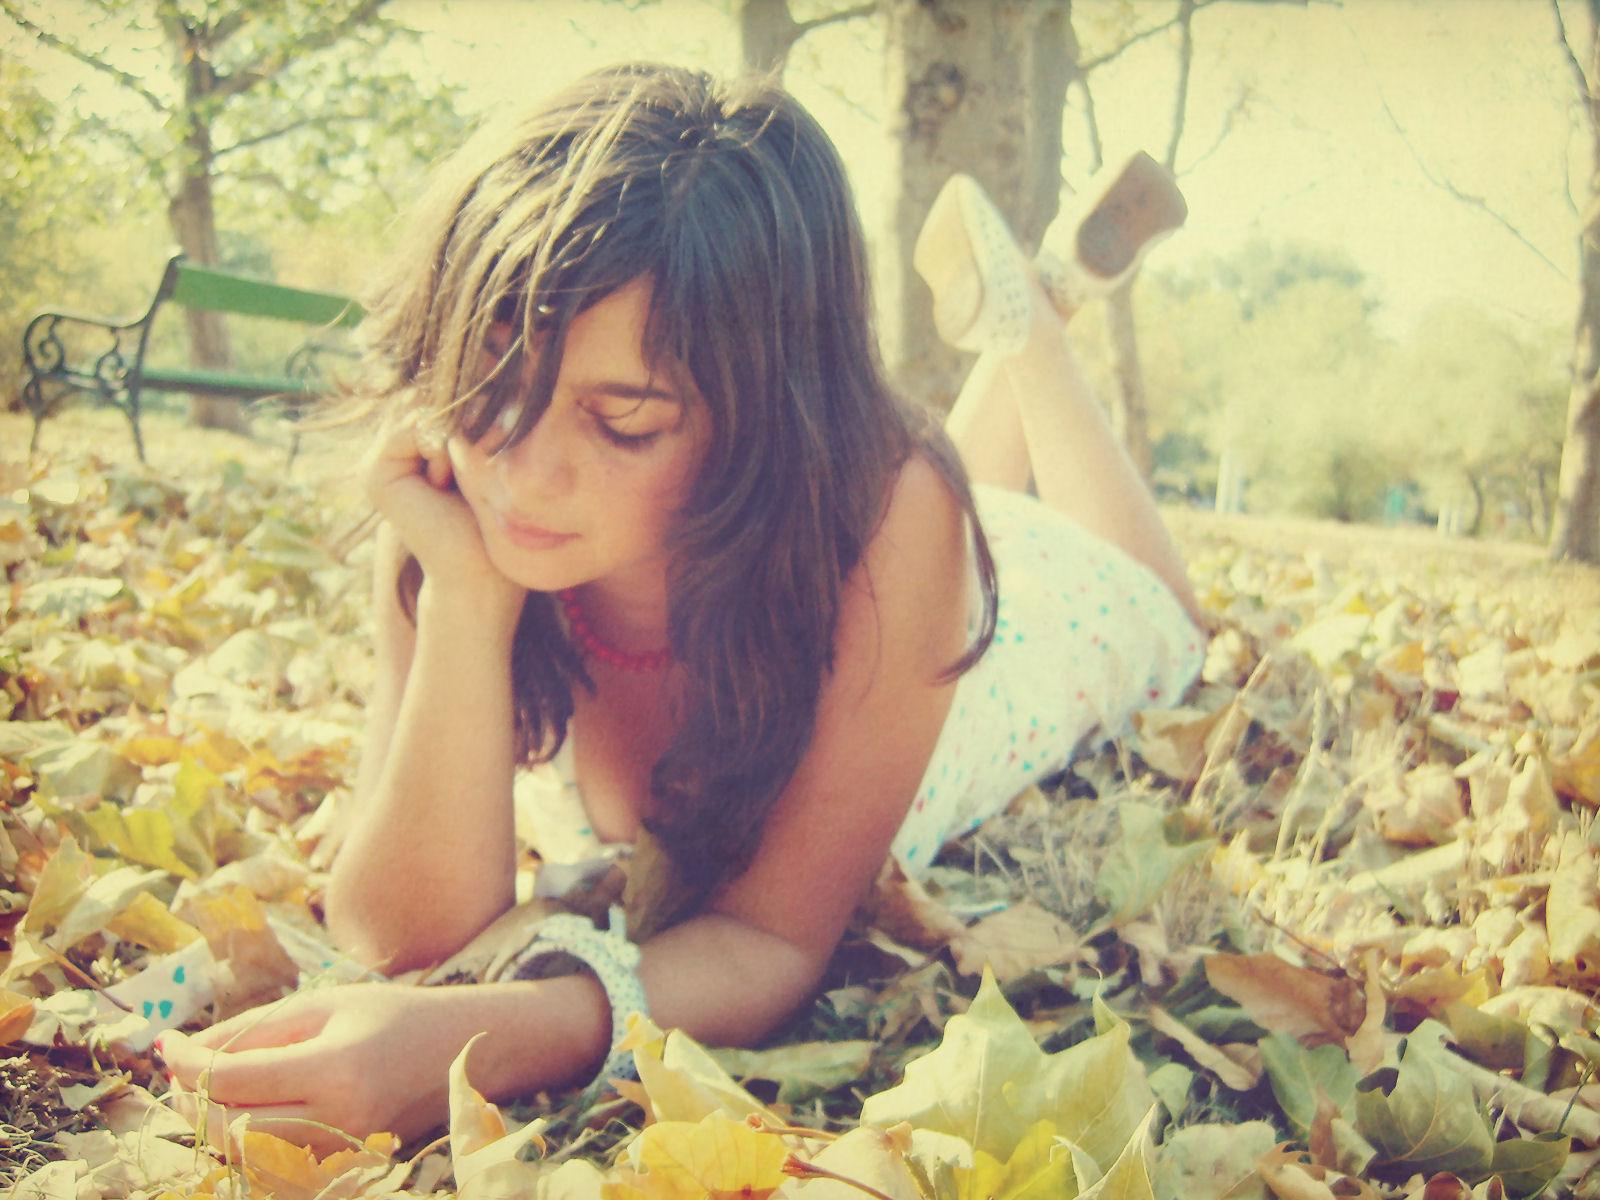 Фото девушек селфи где не видно лица